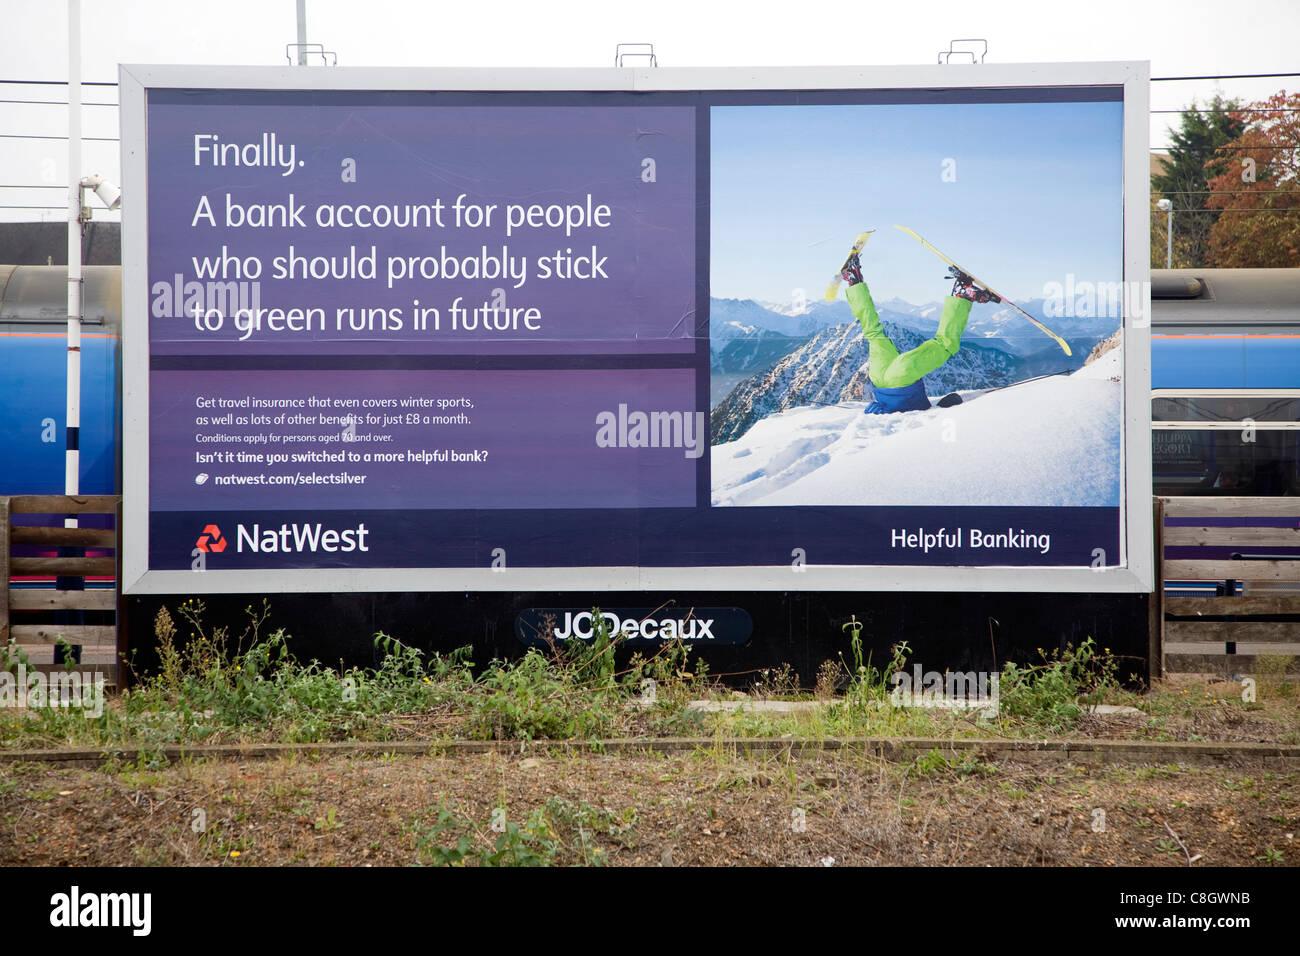 NatWest bank advertising billboard poster - Stock Image